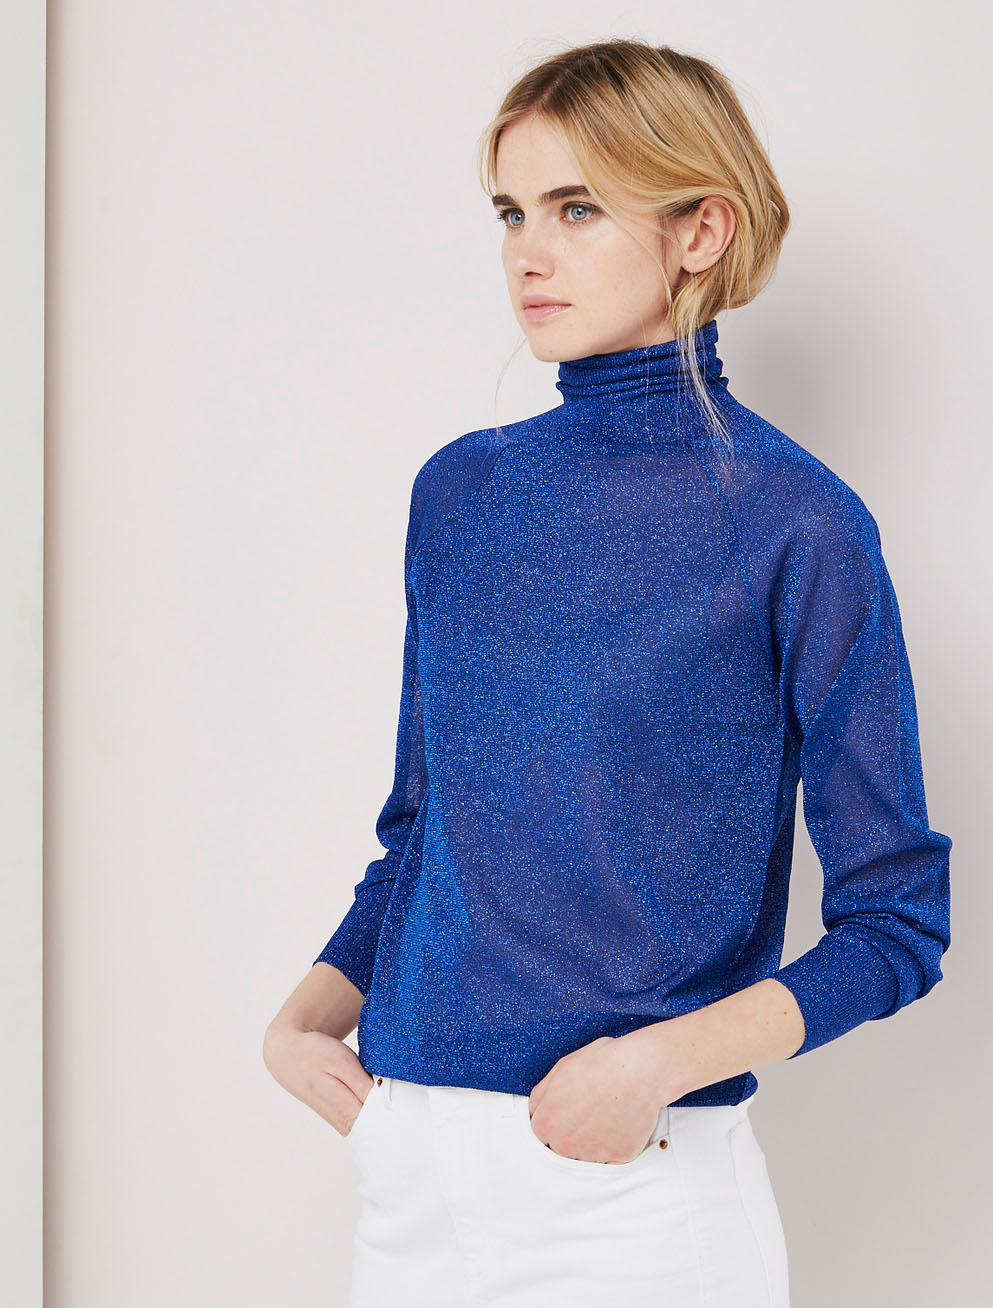 Metallic knitted turtleneck sweater